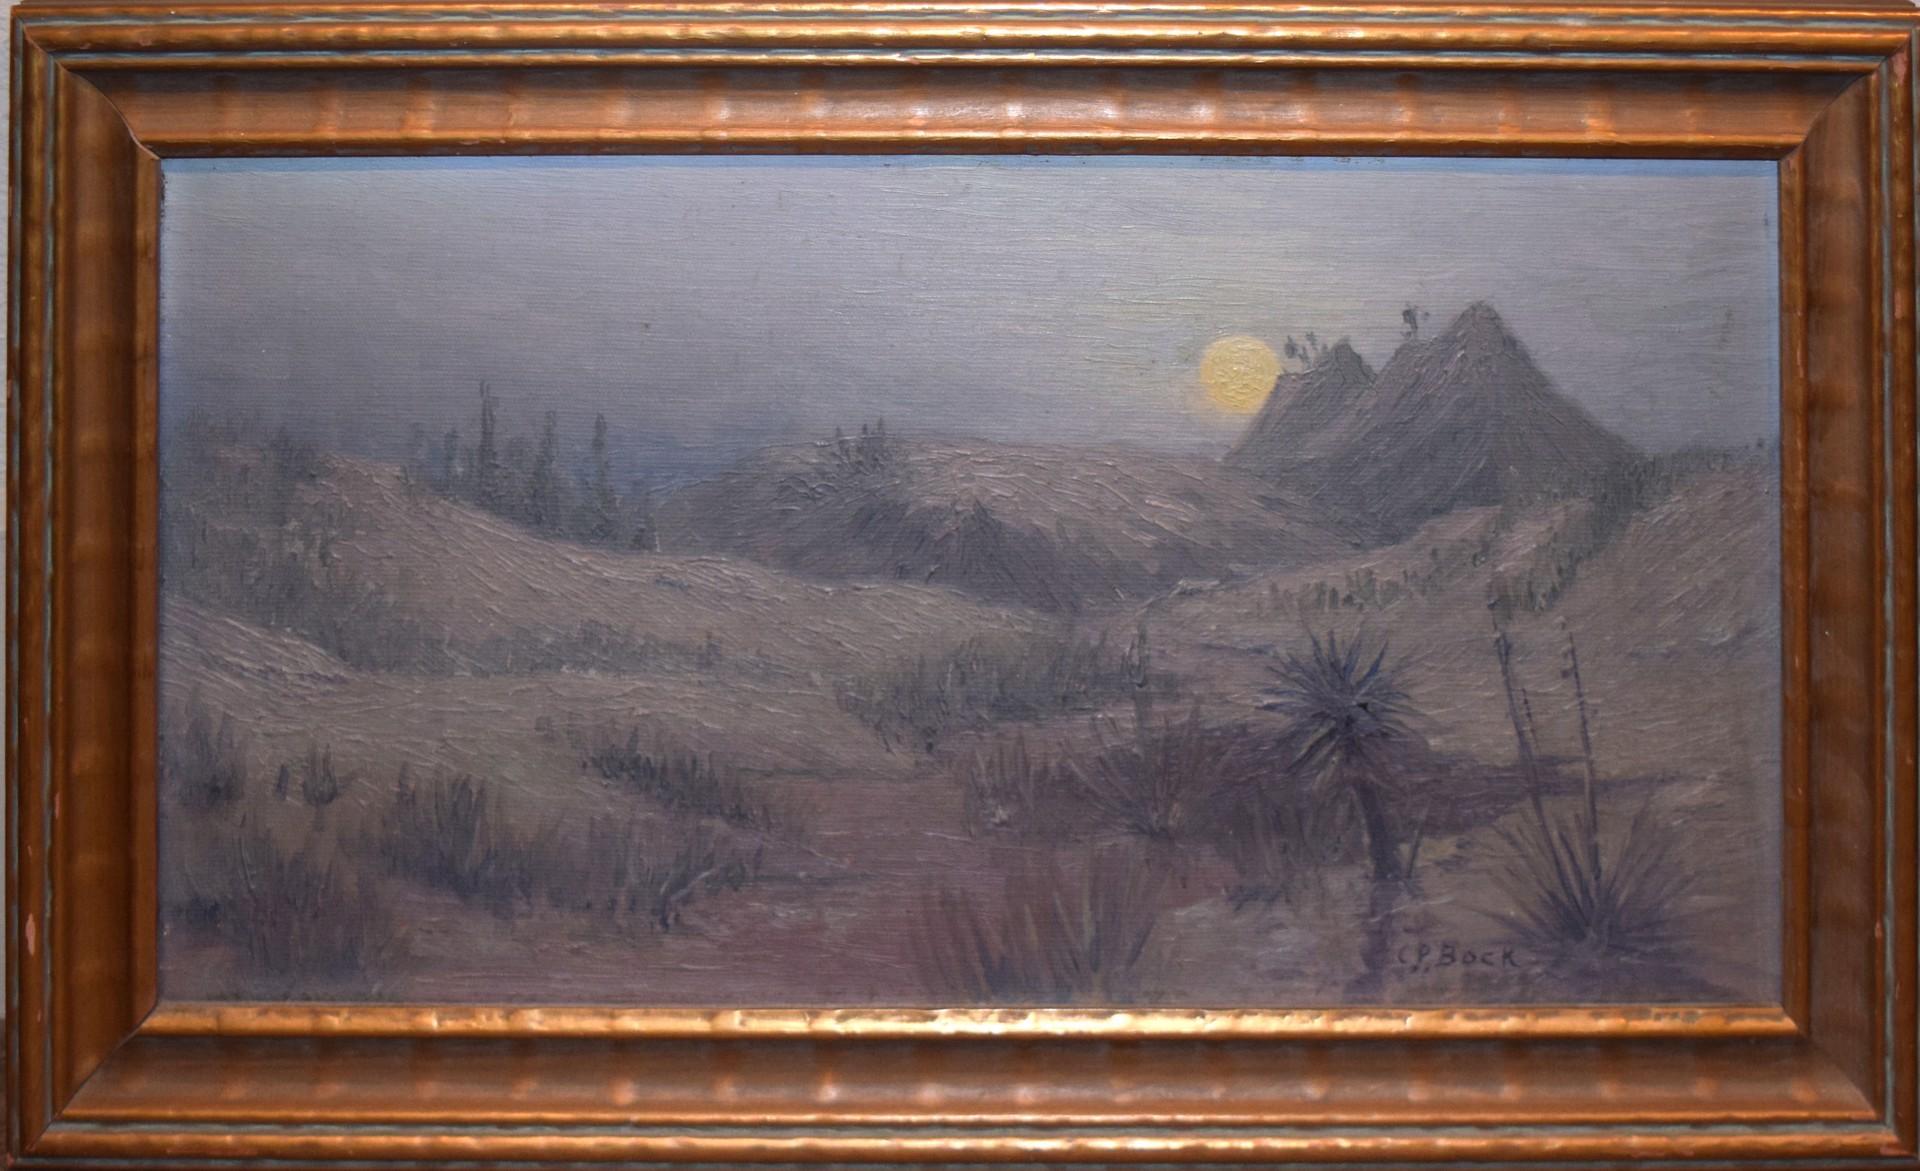 Desert Solitude by Charles Peter Bock